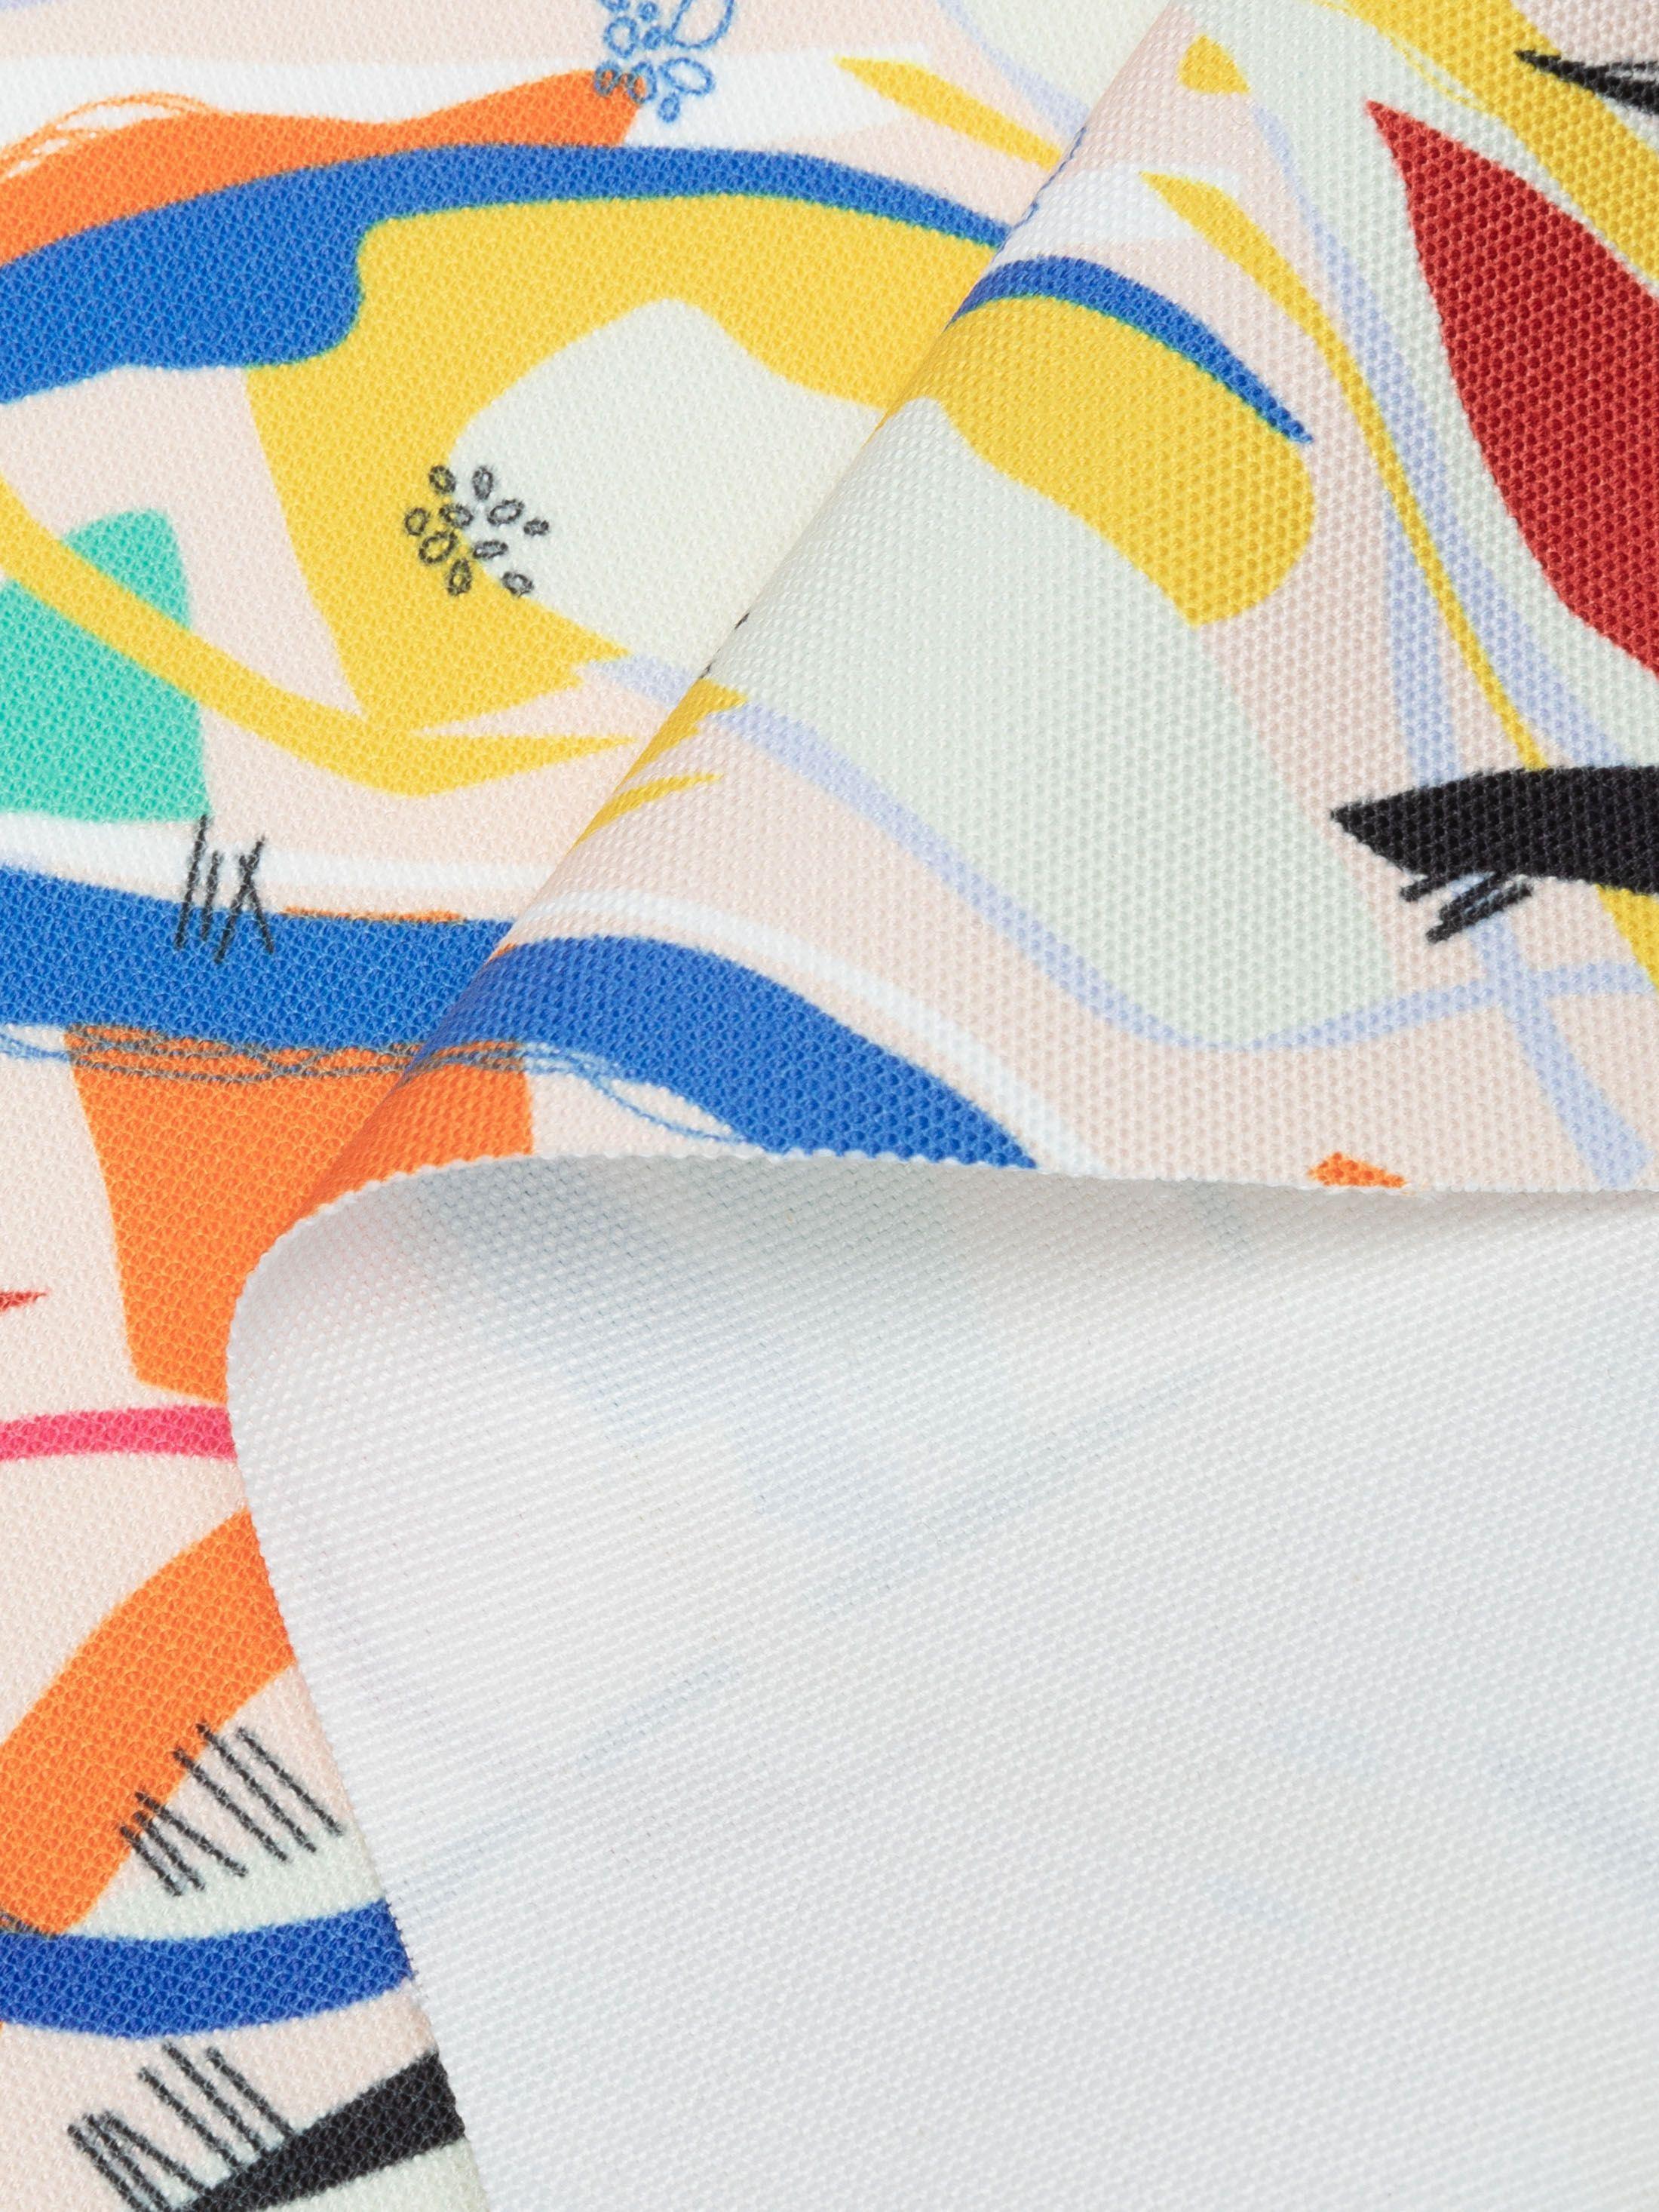 Tessuto in tela nautica stampata